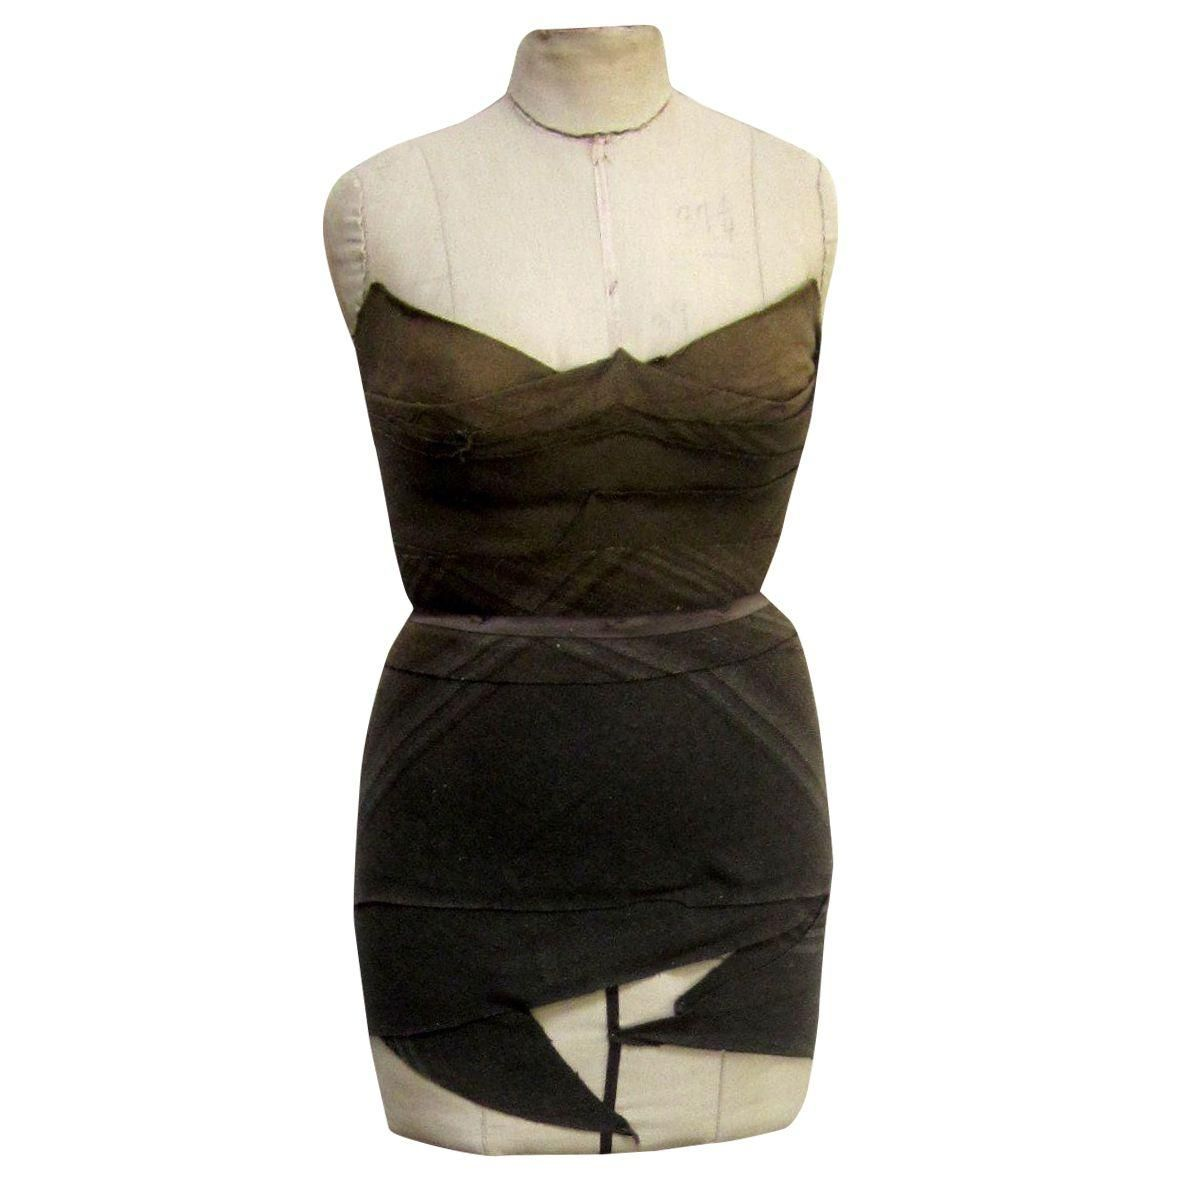 Antique corset mannequin dress form with images